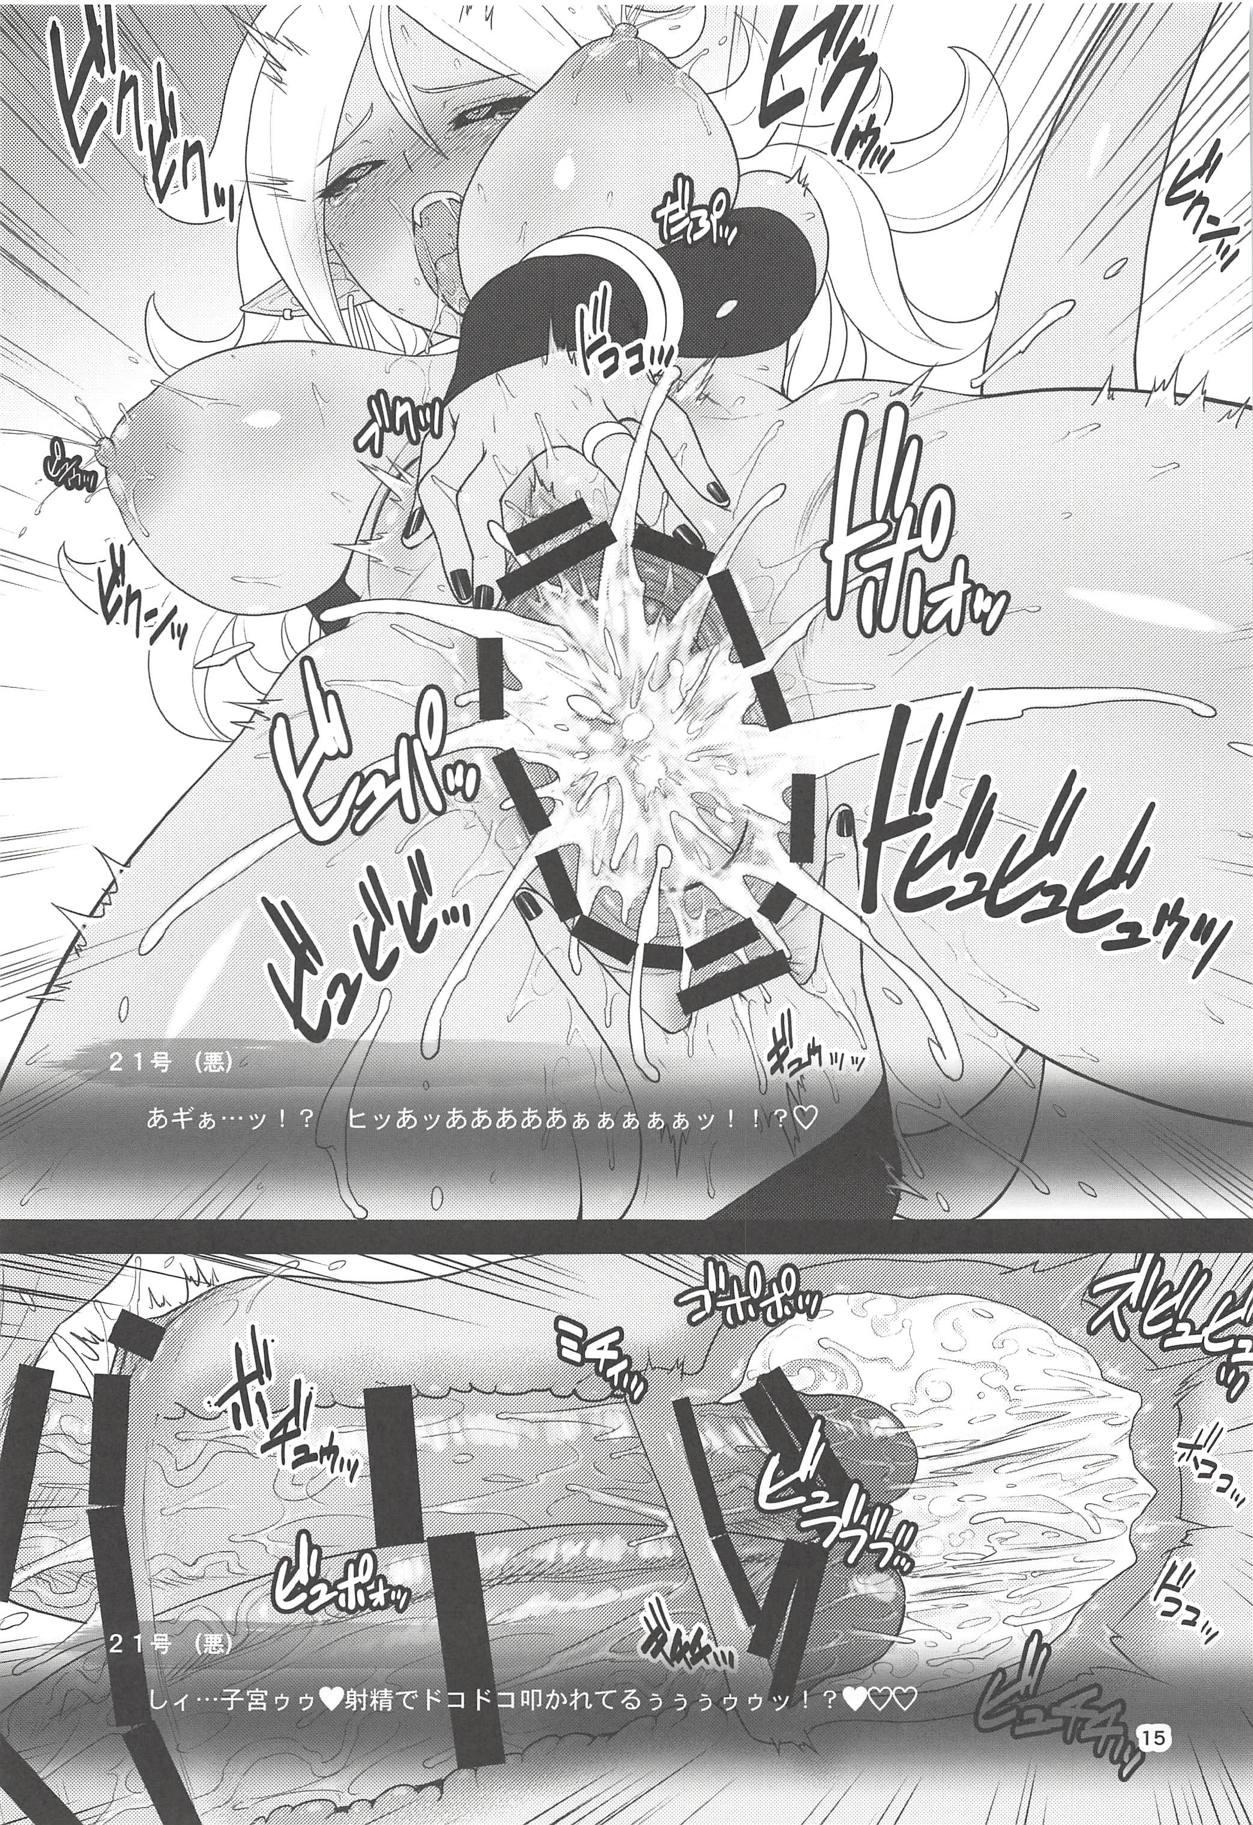 (C94) [Shinnihon Pepsitou (St.germain-sal)] 1-tsubu de 2-do Oishii (Dragon Ball FighterZ) 13